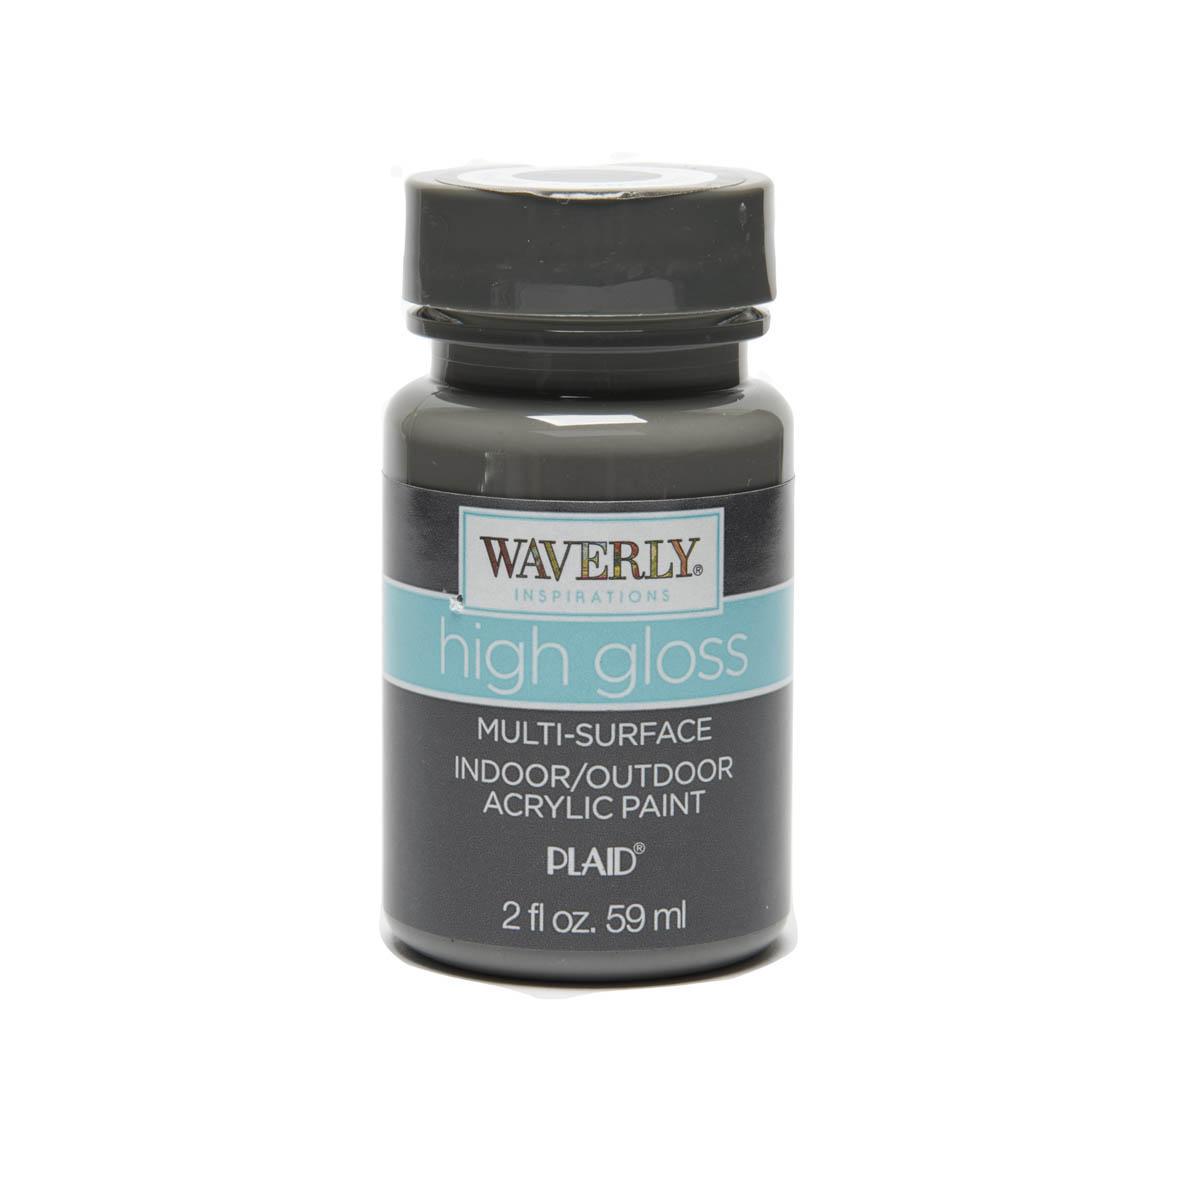 Waverly ® Inspirations High Gloss Multi-Surface Acrylic Paint - Elephant, 2 oz.